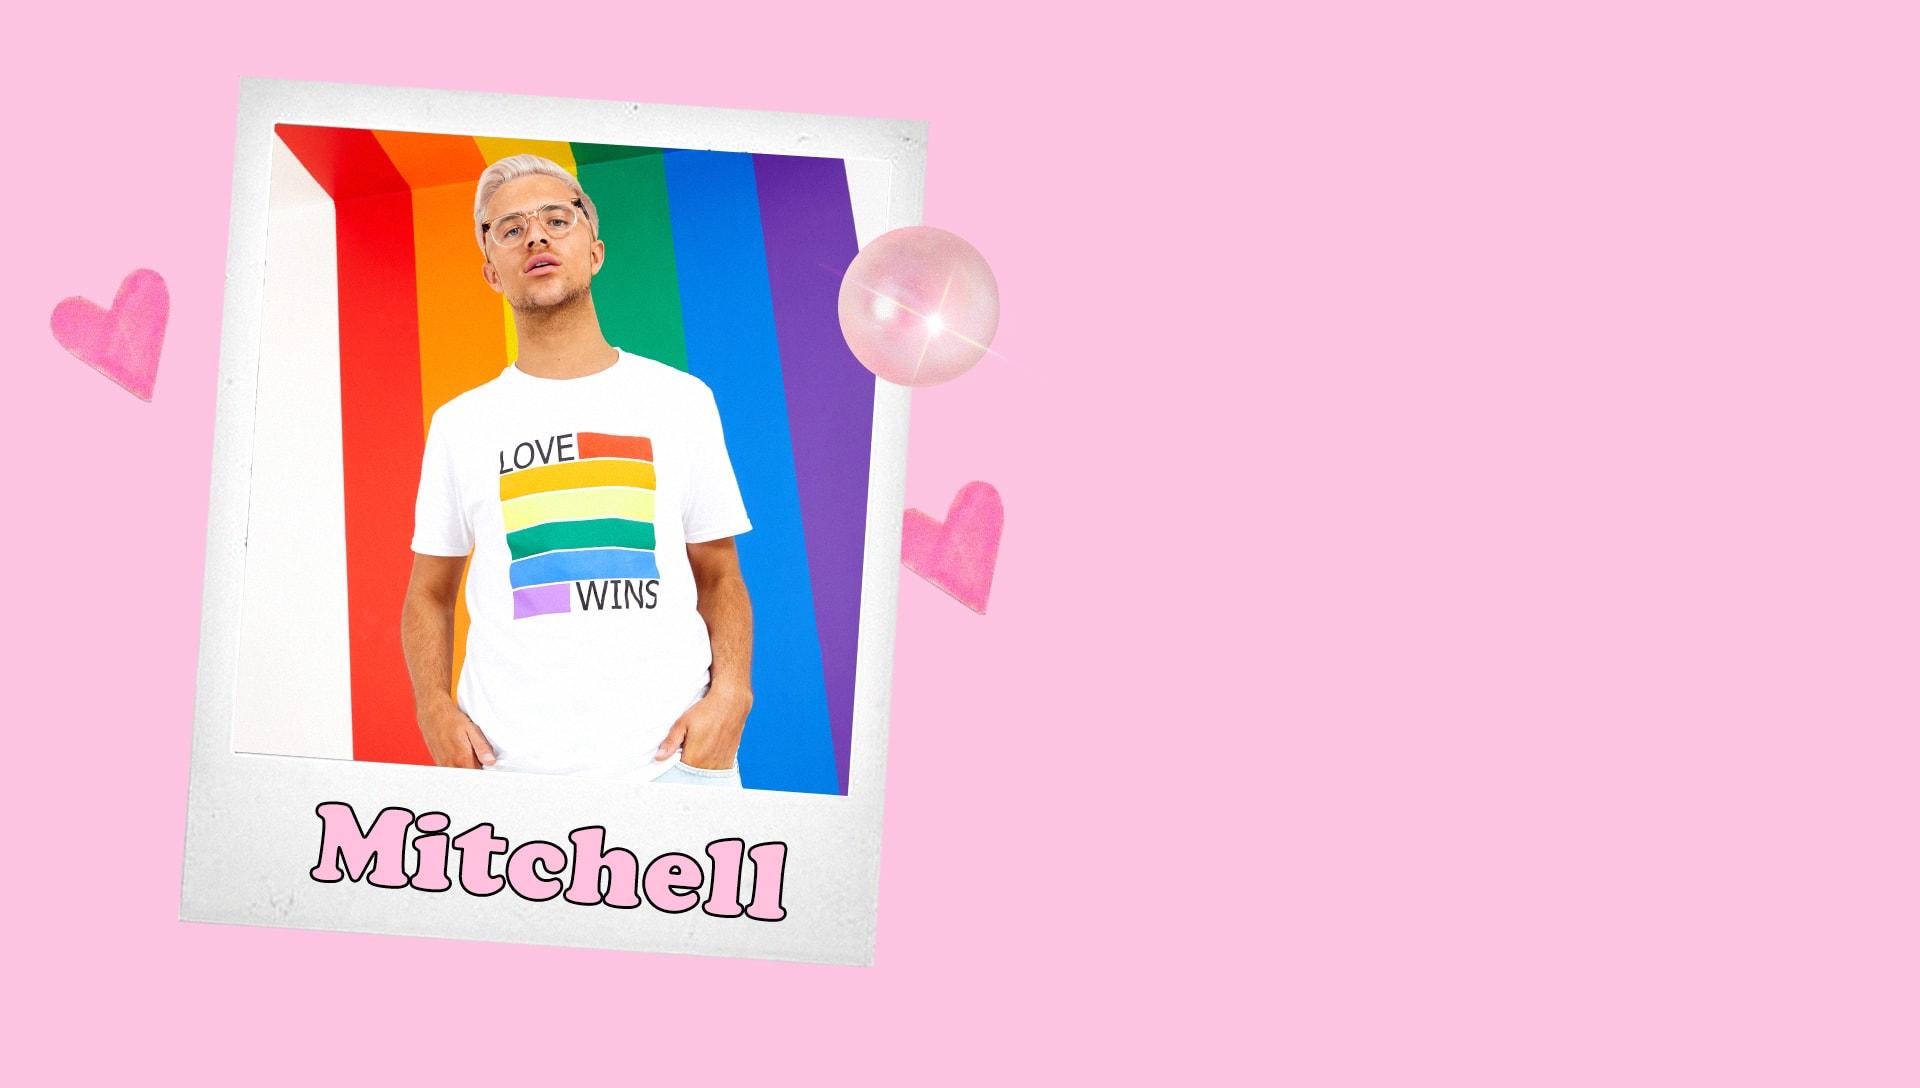 Mitchell Love Wins White Tee